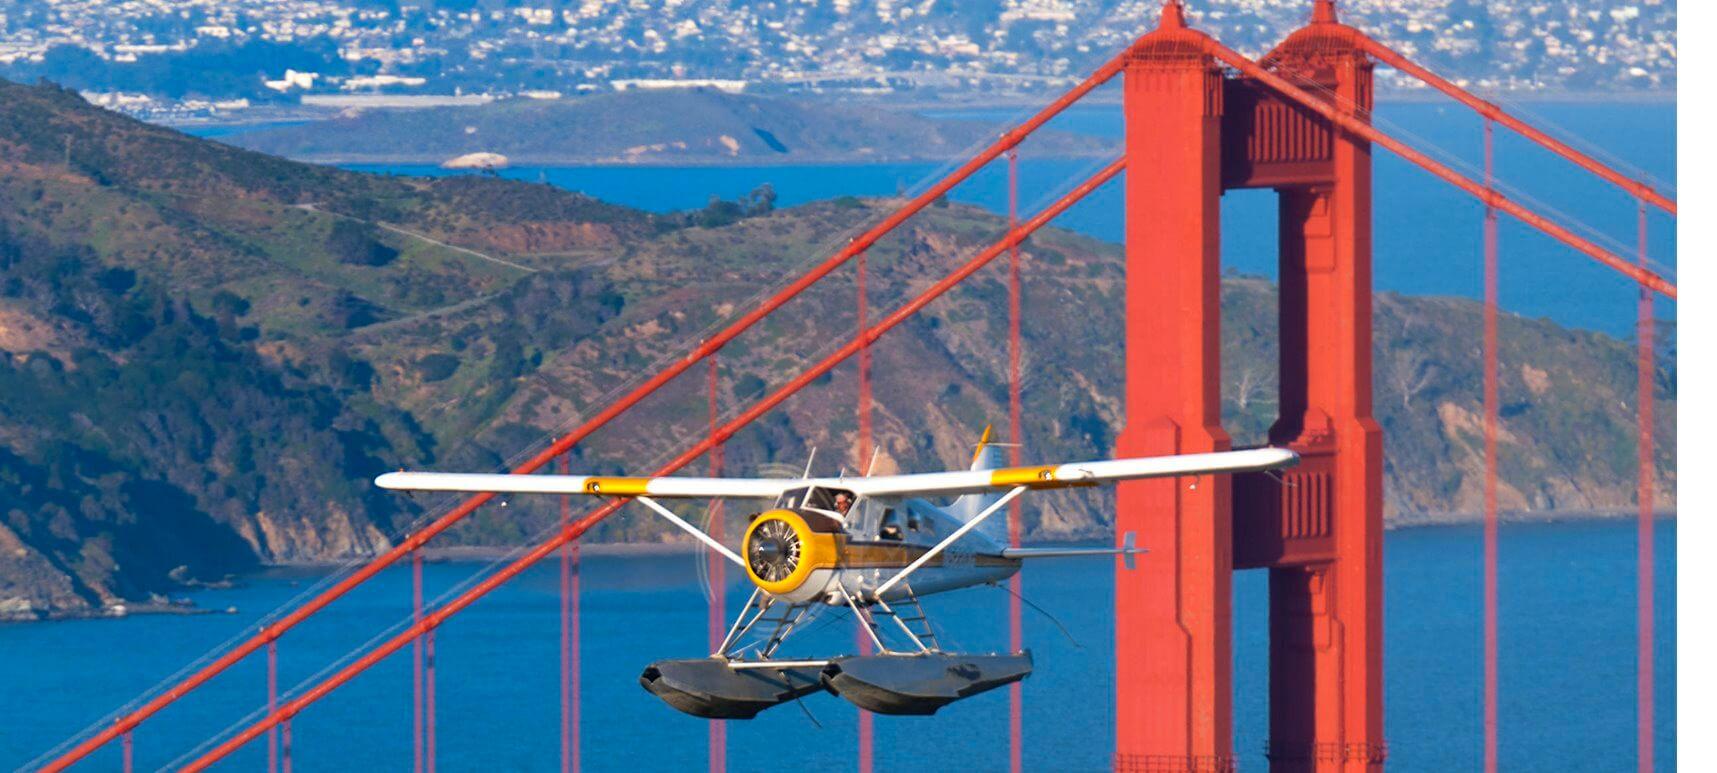 seaplane_airtour-flight-helio-choper-sfo-airtousfo